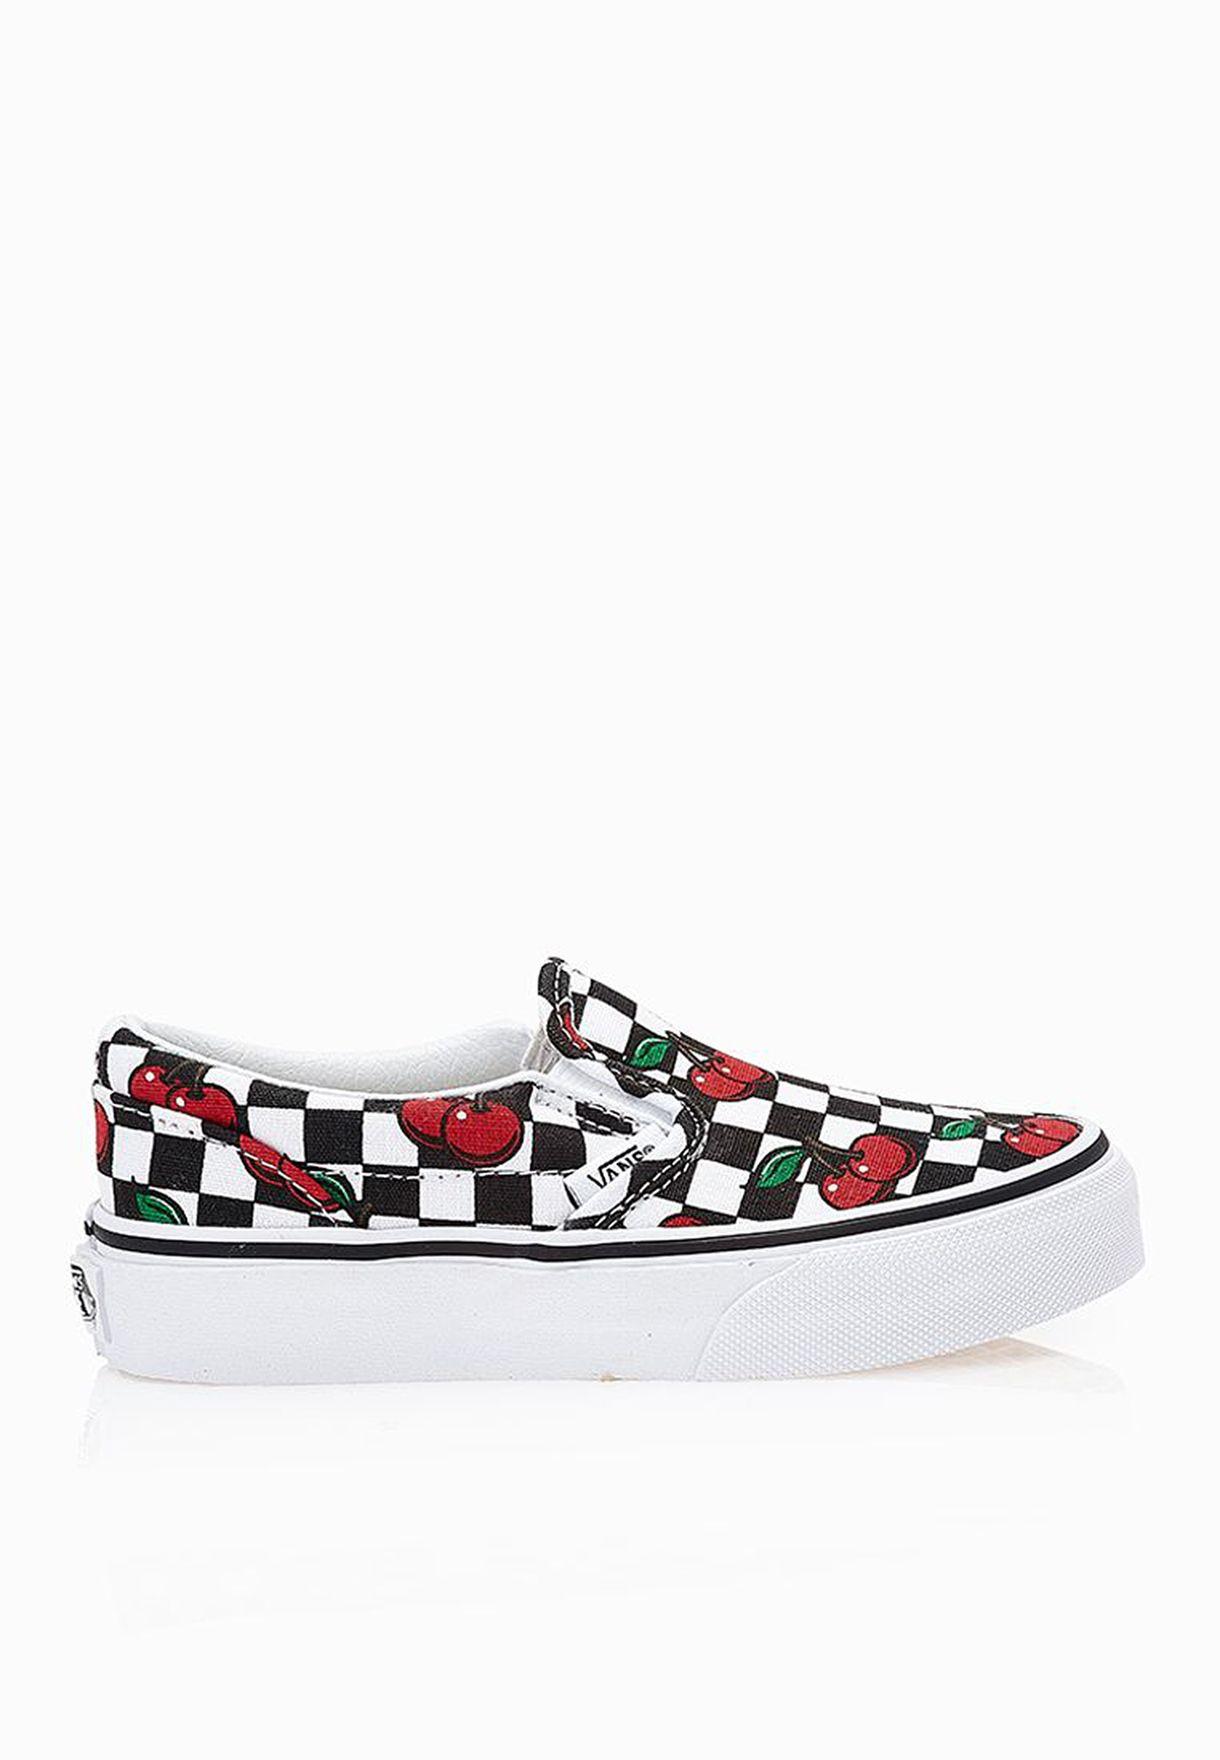 5266cf90f6 Shop Vans multicolor Classic Slip-On Kids VAFT-1SQGFY for Kids in ...